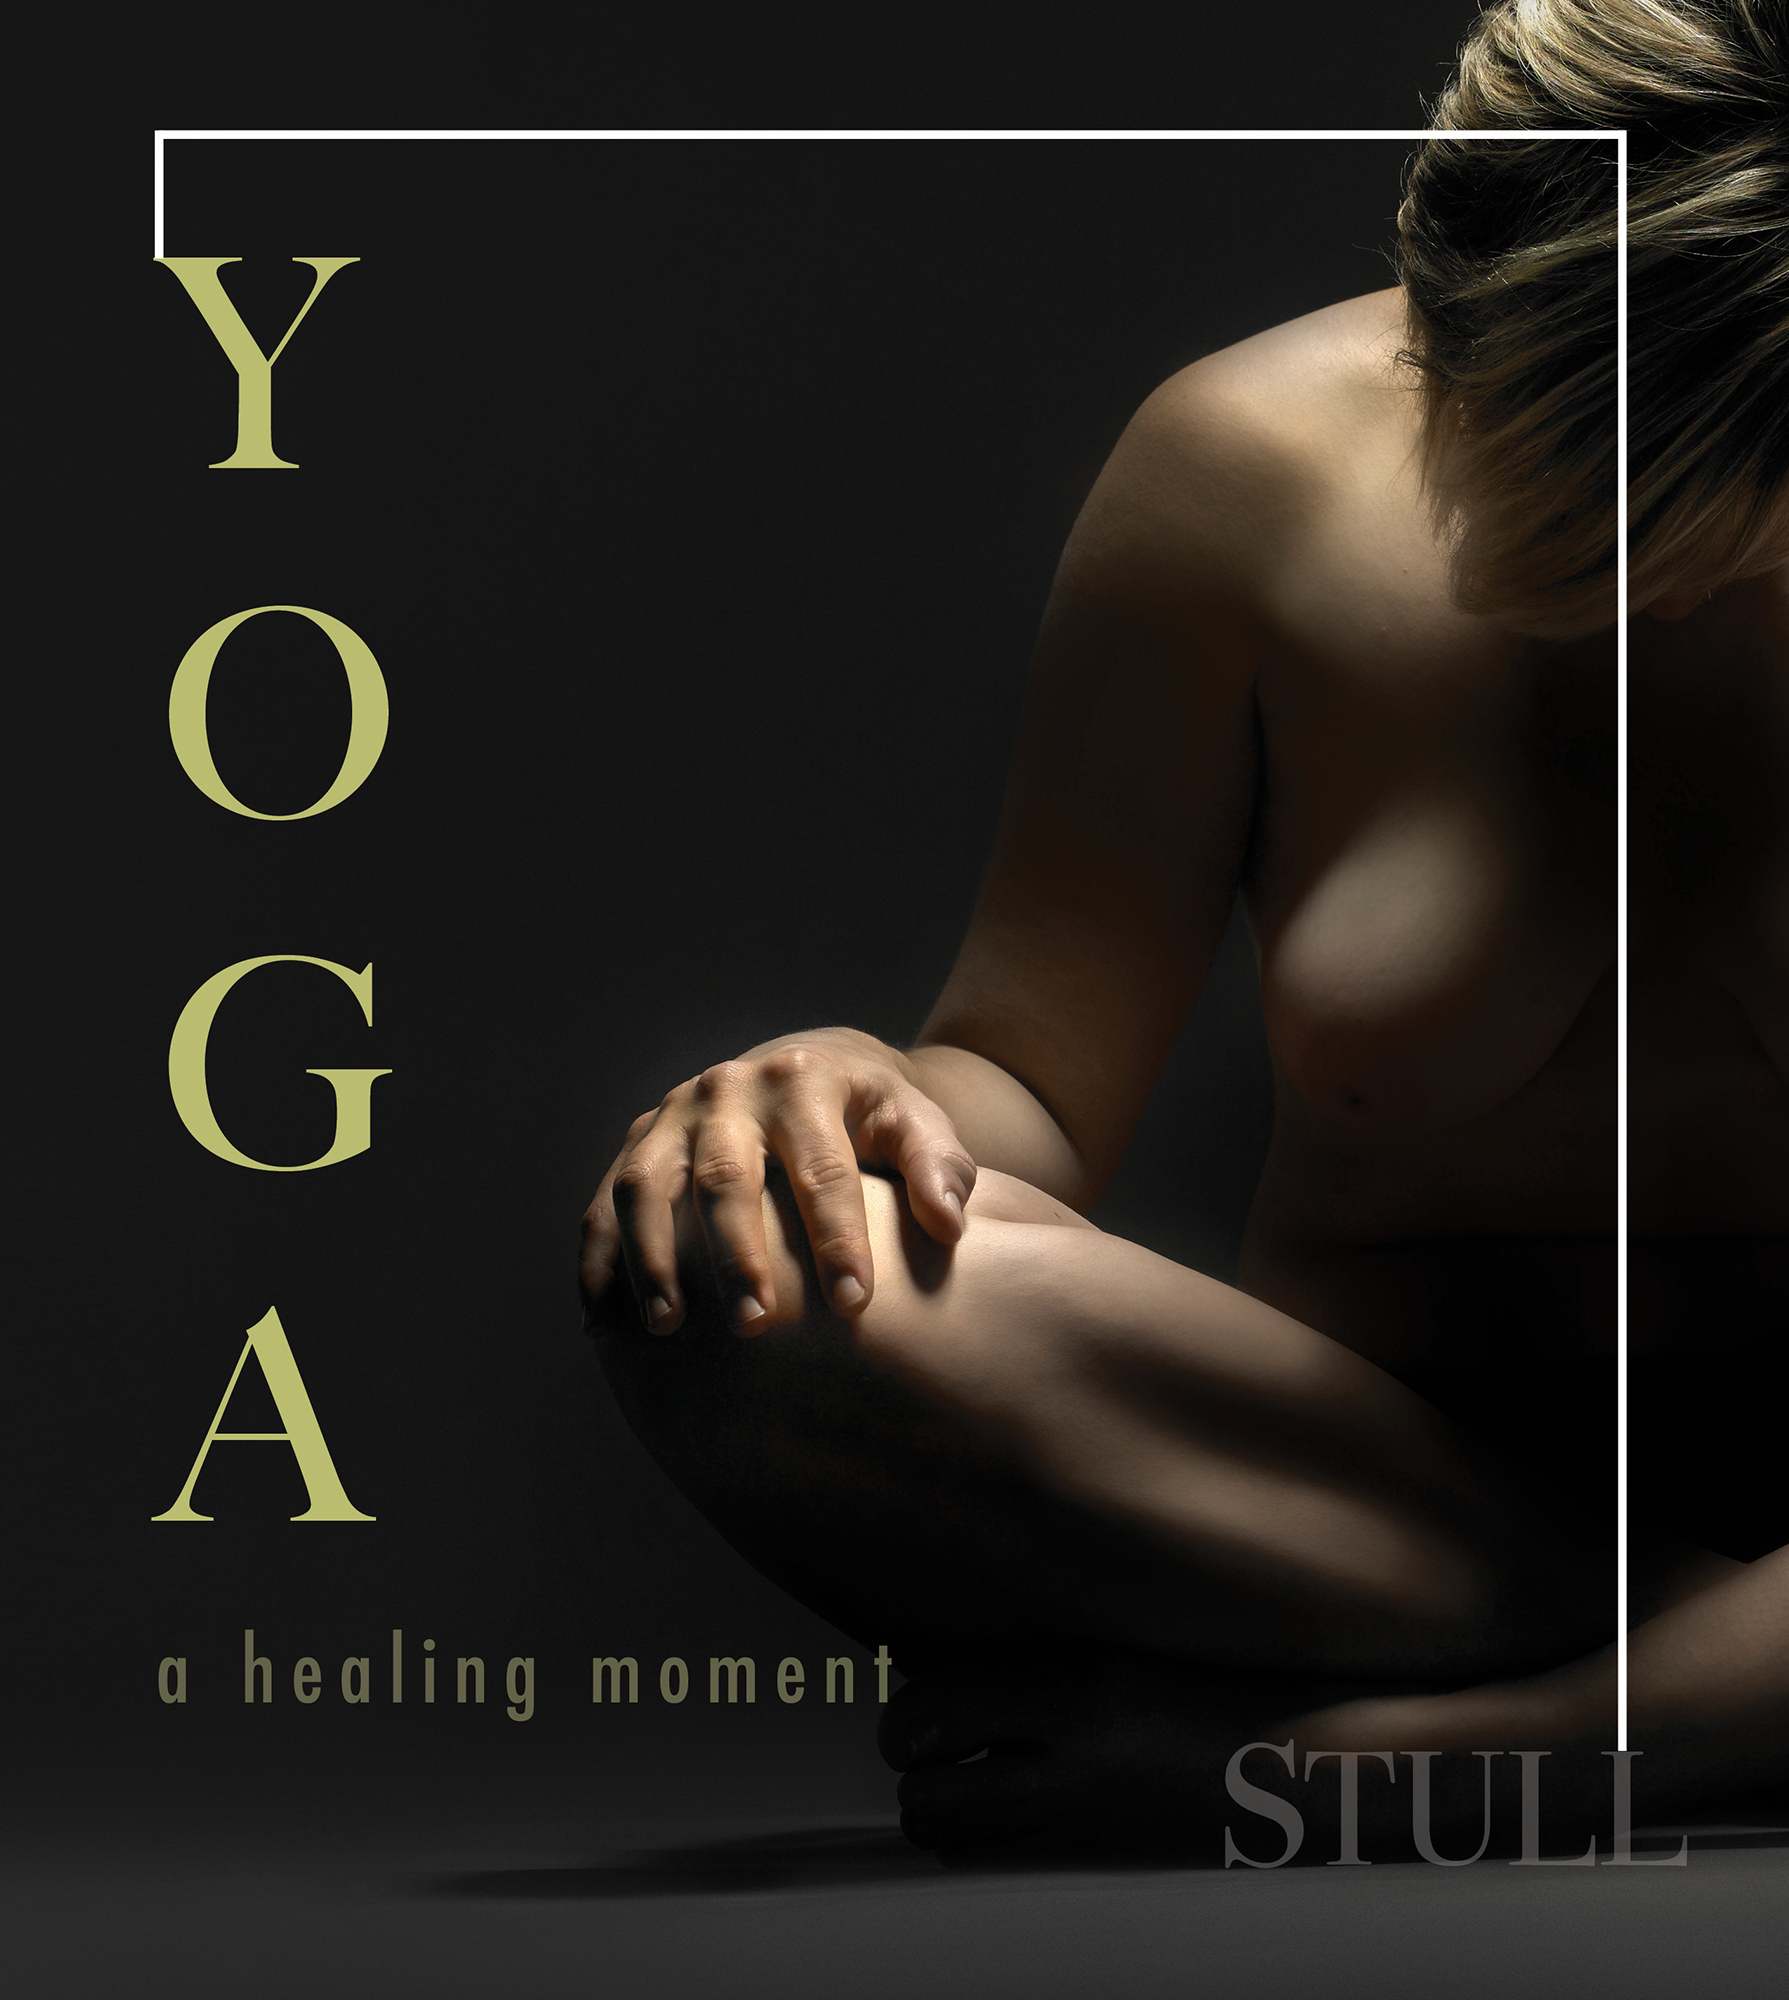 Yoga, by Patrick Stull